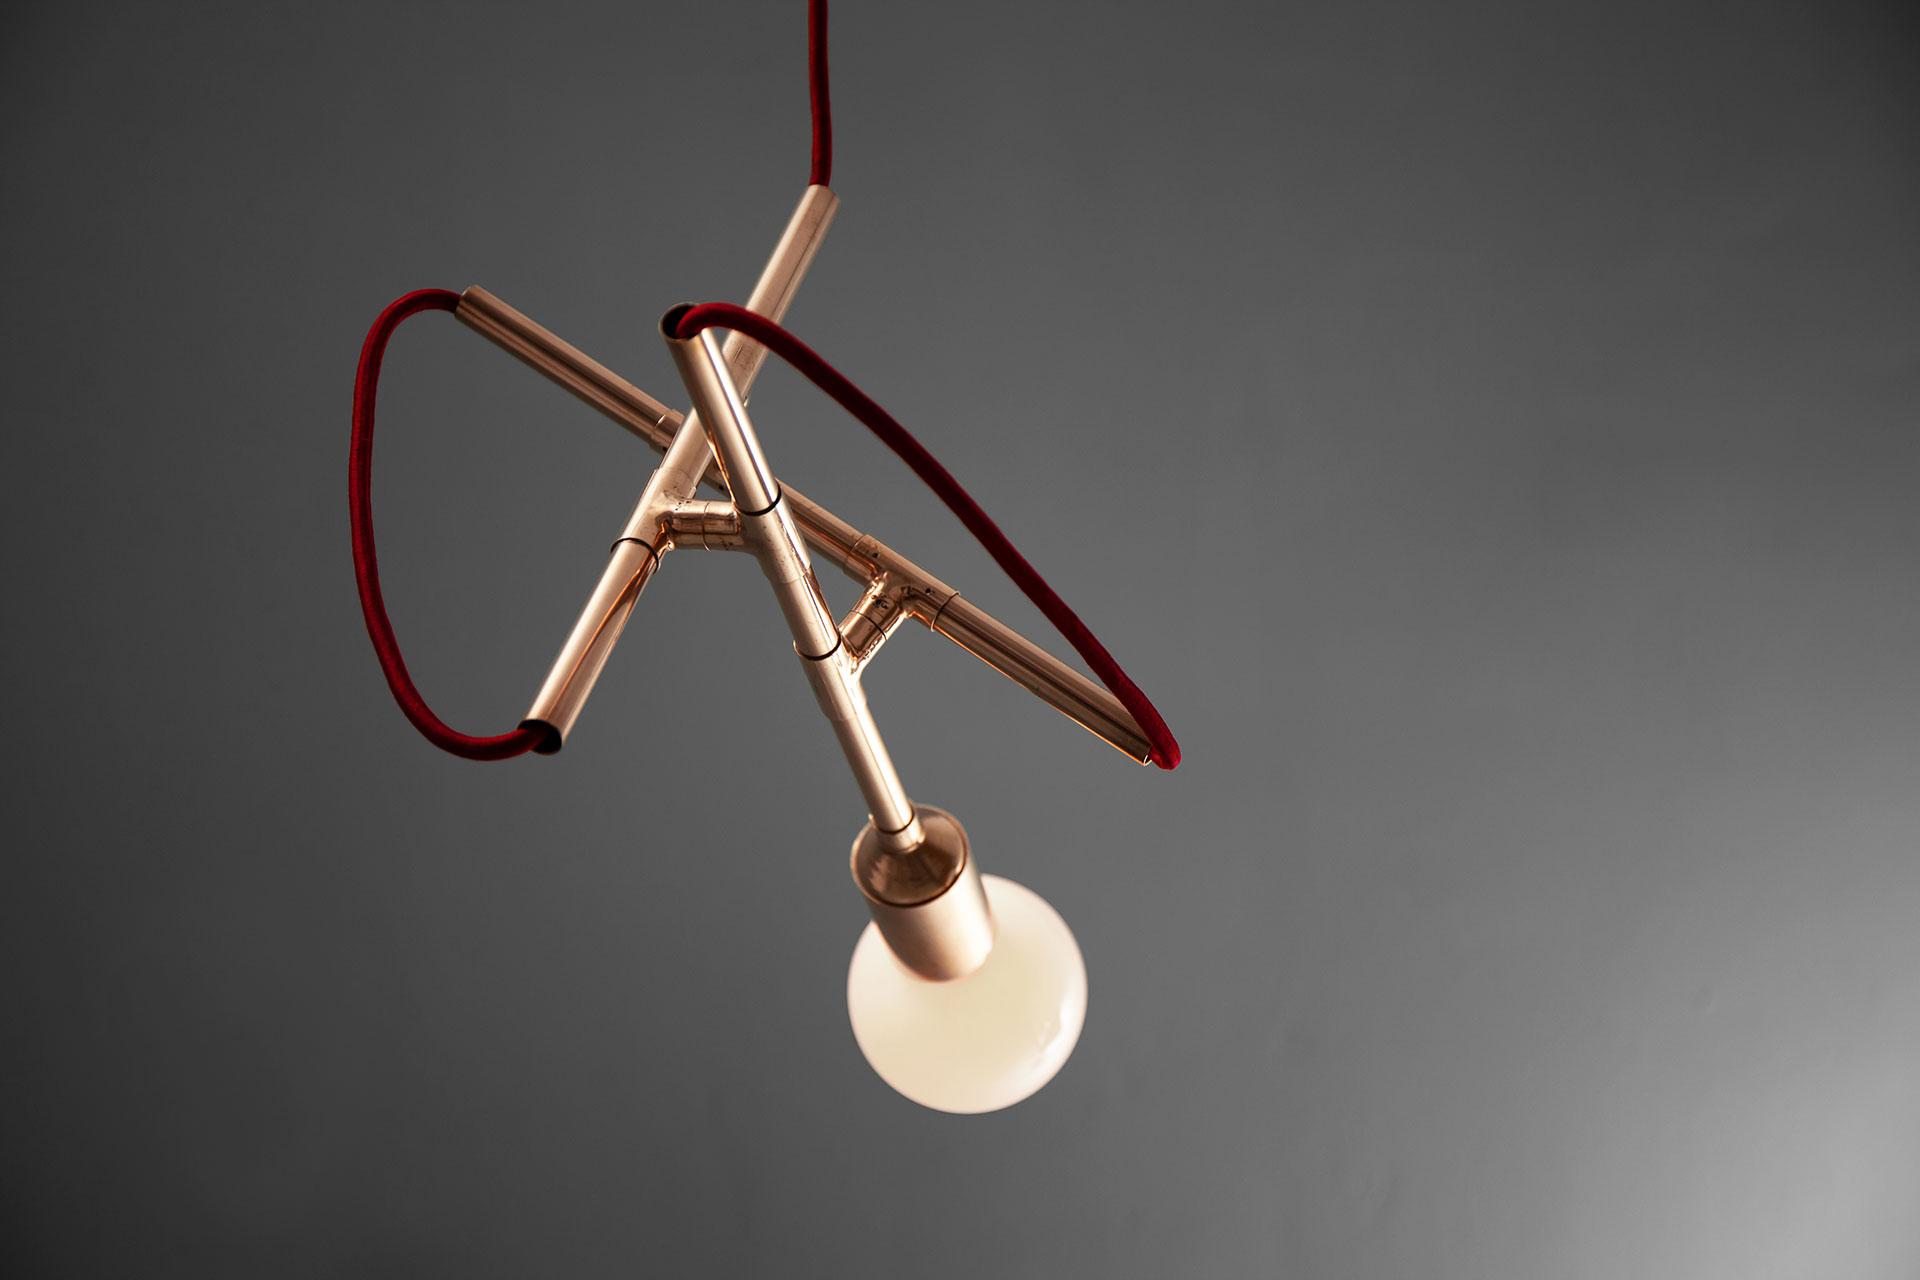 Conceptual design copper pendant lamp